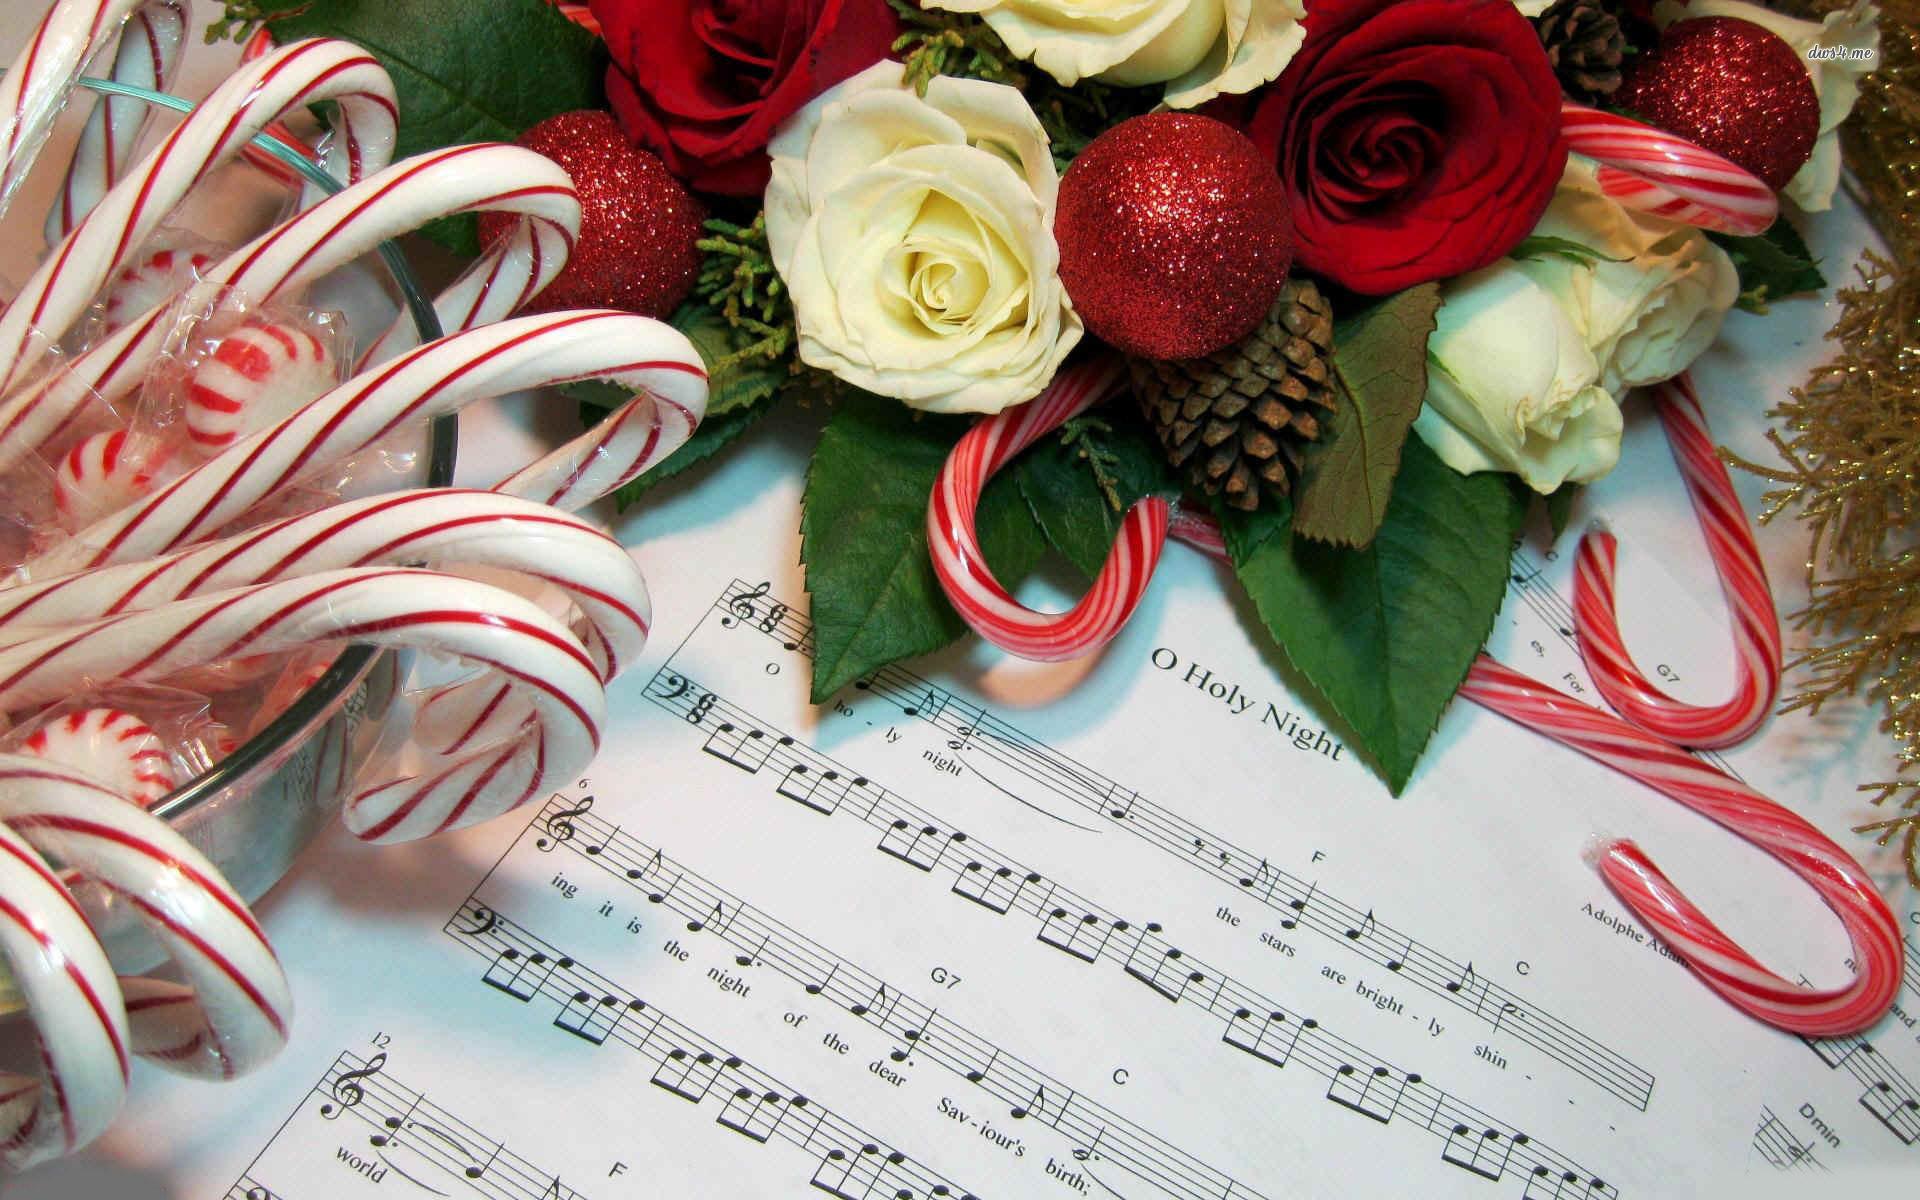 Christmas Candy Song  Christmas carol music sheet wallpaper Holiday wallpapers